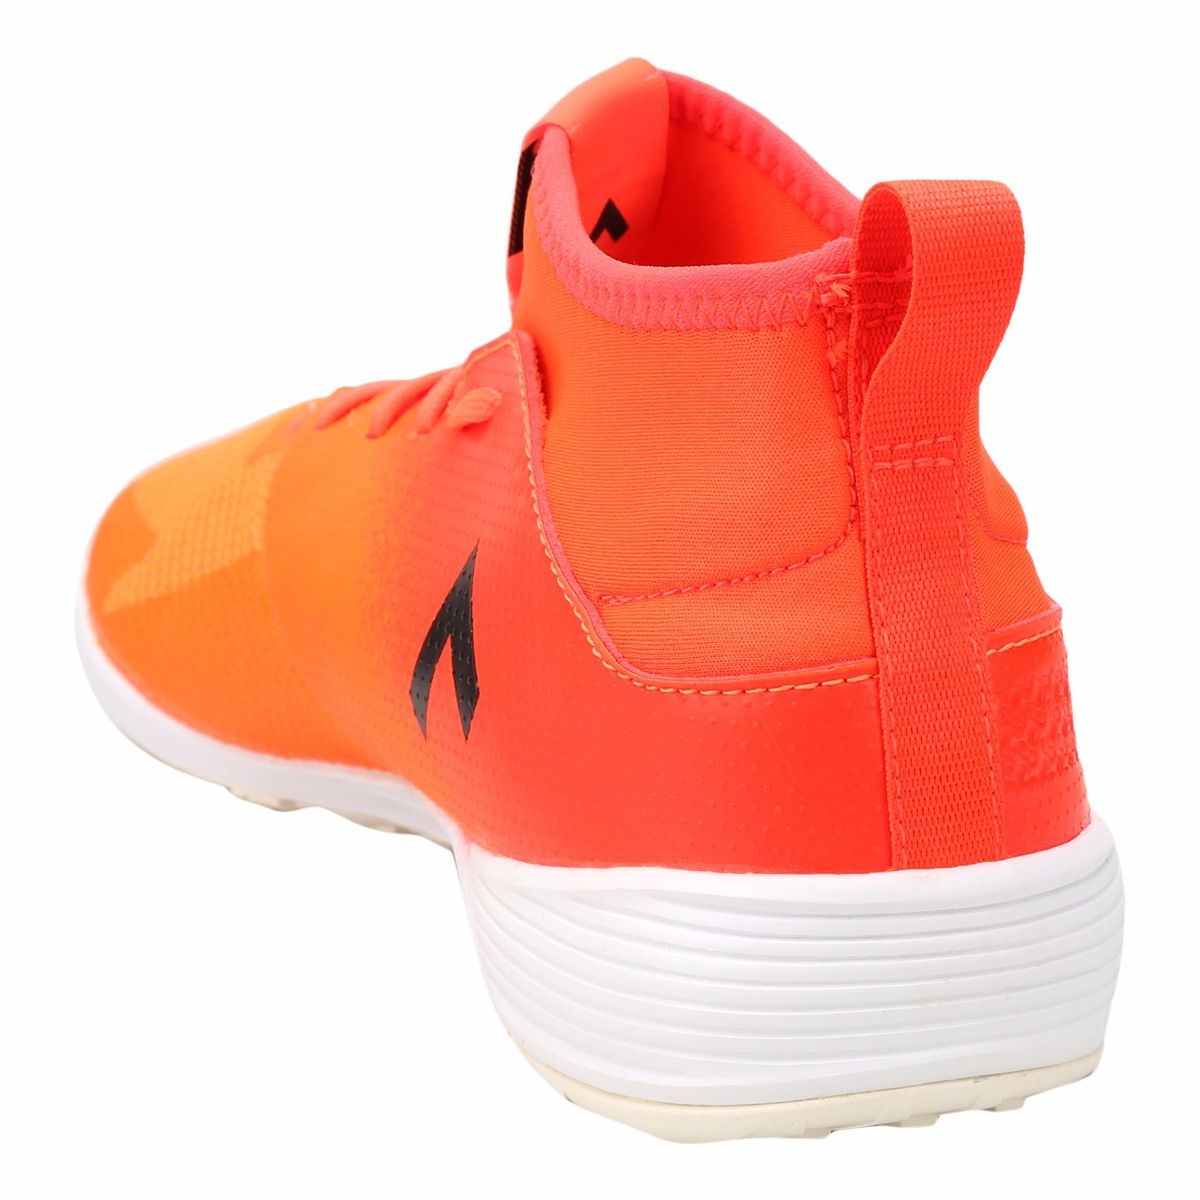 64d7a93f39 Chuteira Futsal adidas Ace 17.3 In Masculina - R  449